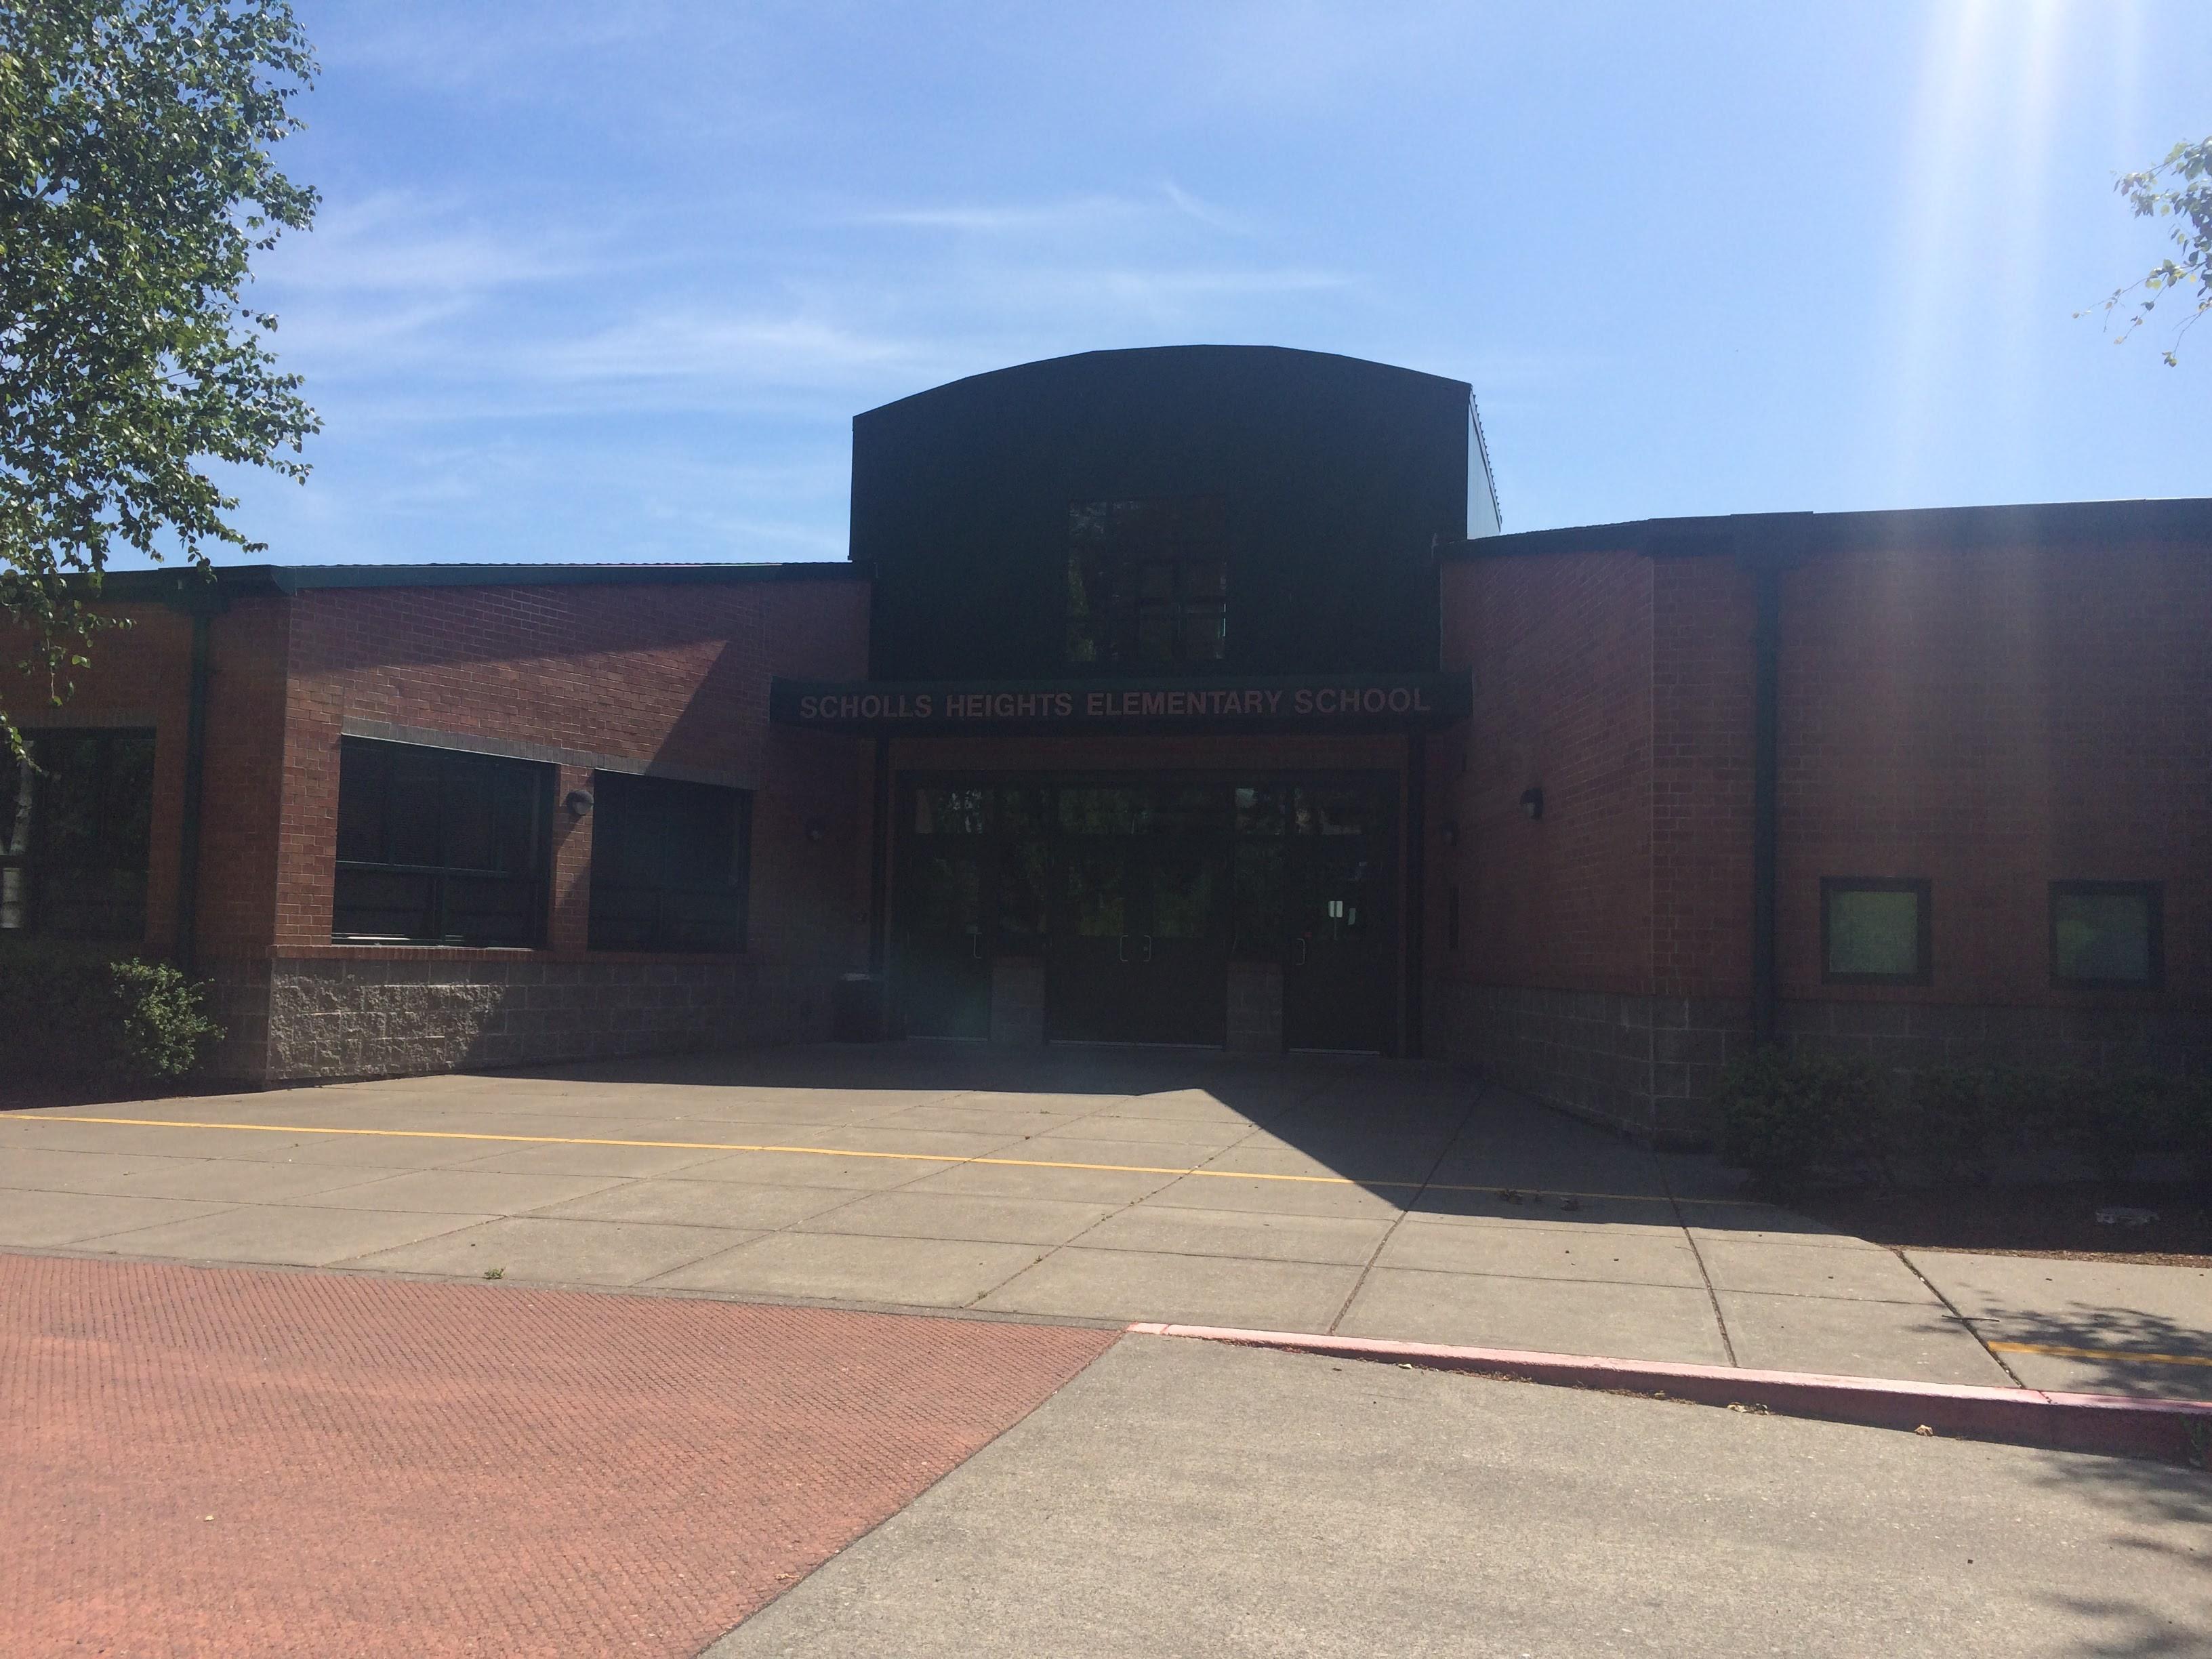 Scholls Heights Elementary School (Beaverton, Oregon) Homes for Sale